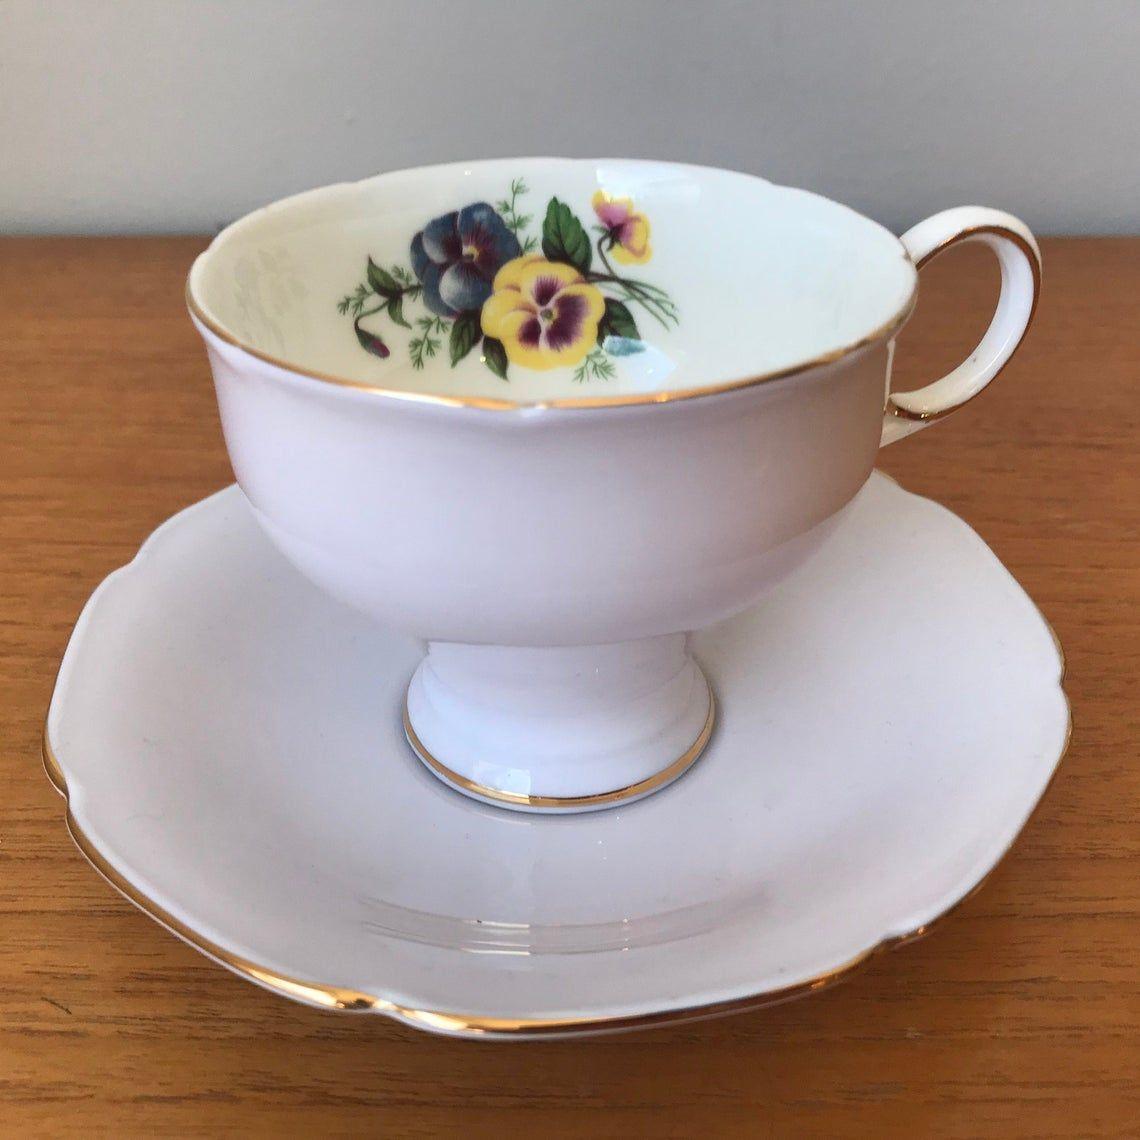 Light Purple Paragon Vintage Tea Cup and Saucer, Purple Yellow and Blue Pansy Teacup and Saucer, English Floral Bone China 1960s